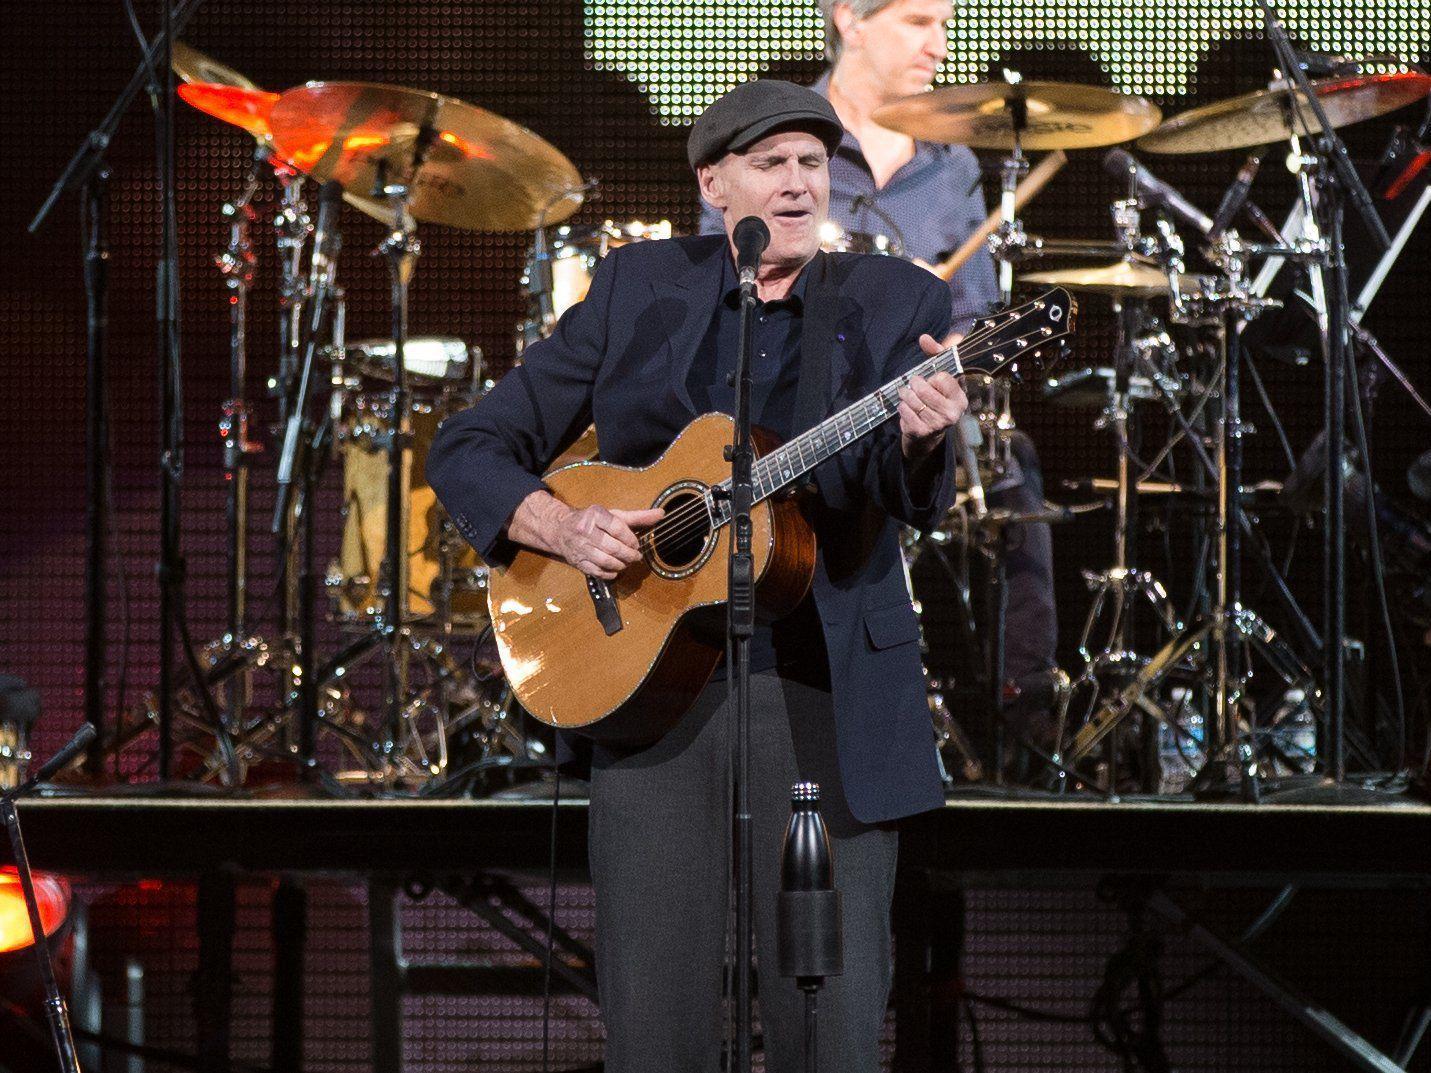 Review: Two of the best living singer-songwriters landed in Nebraska last night